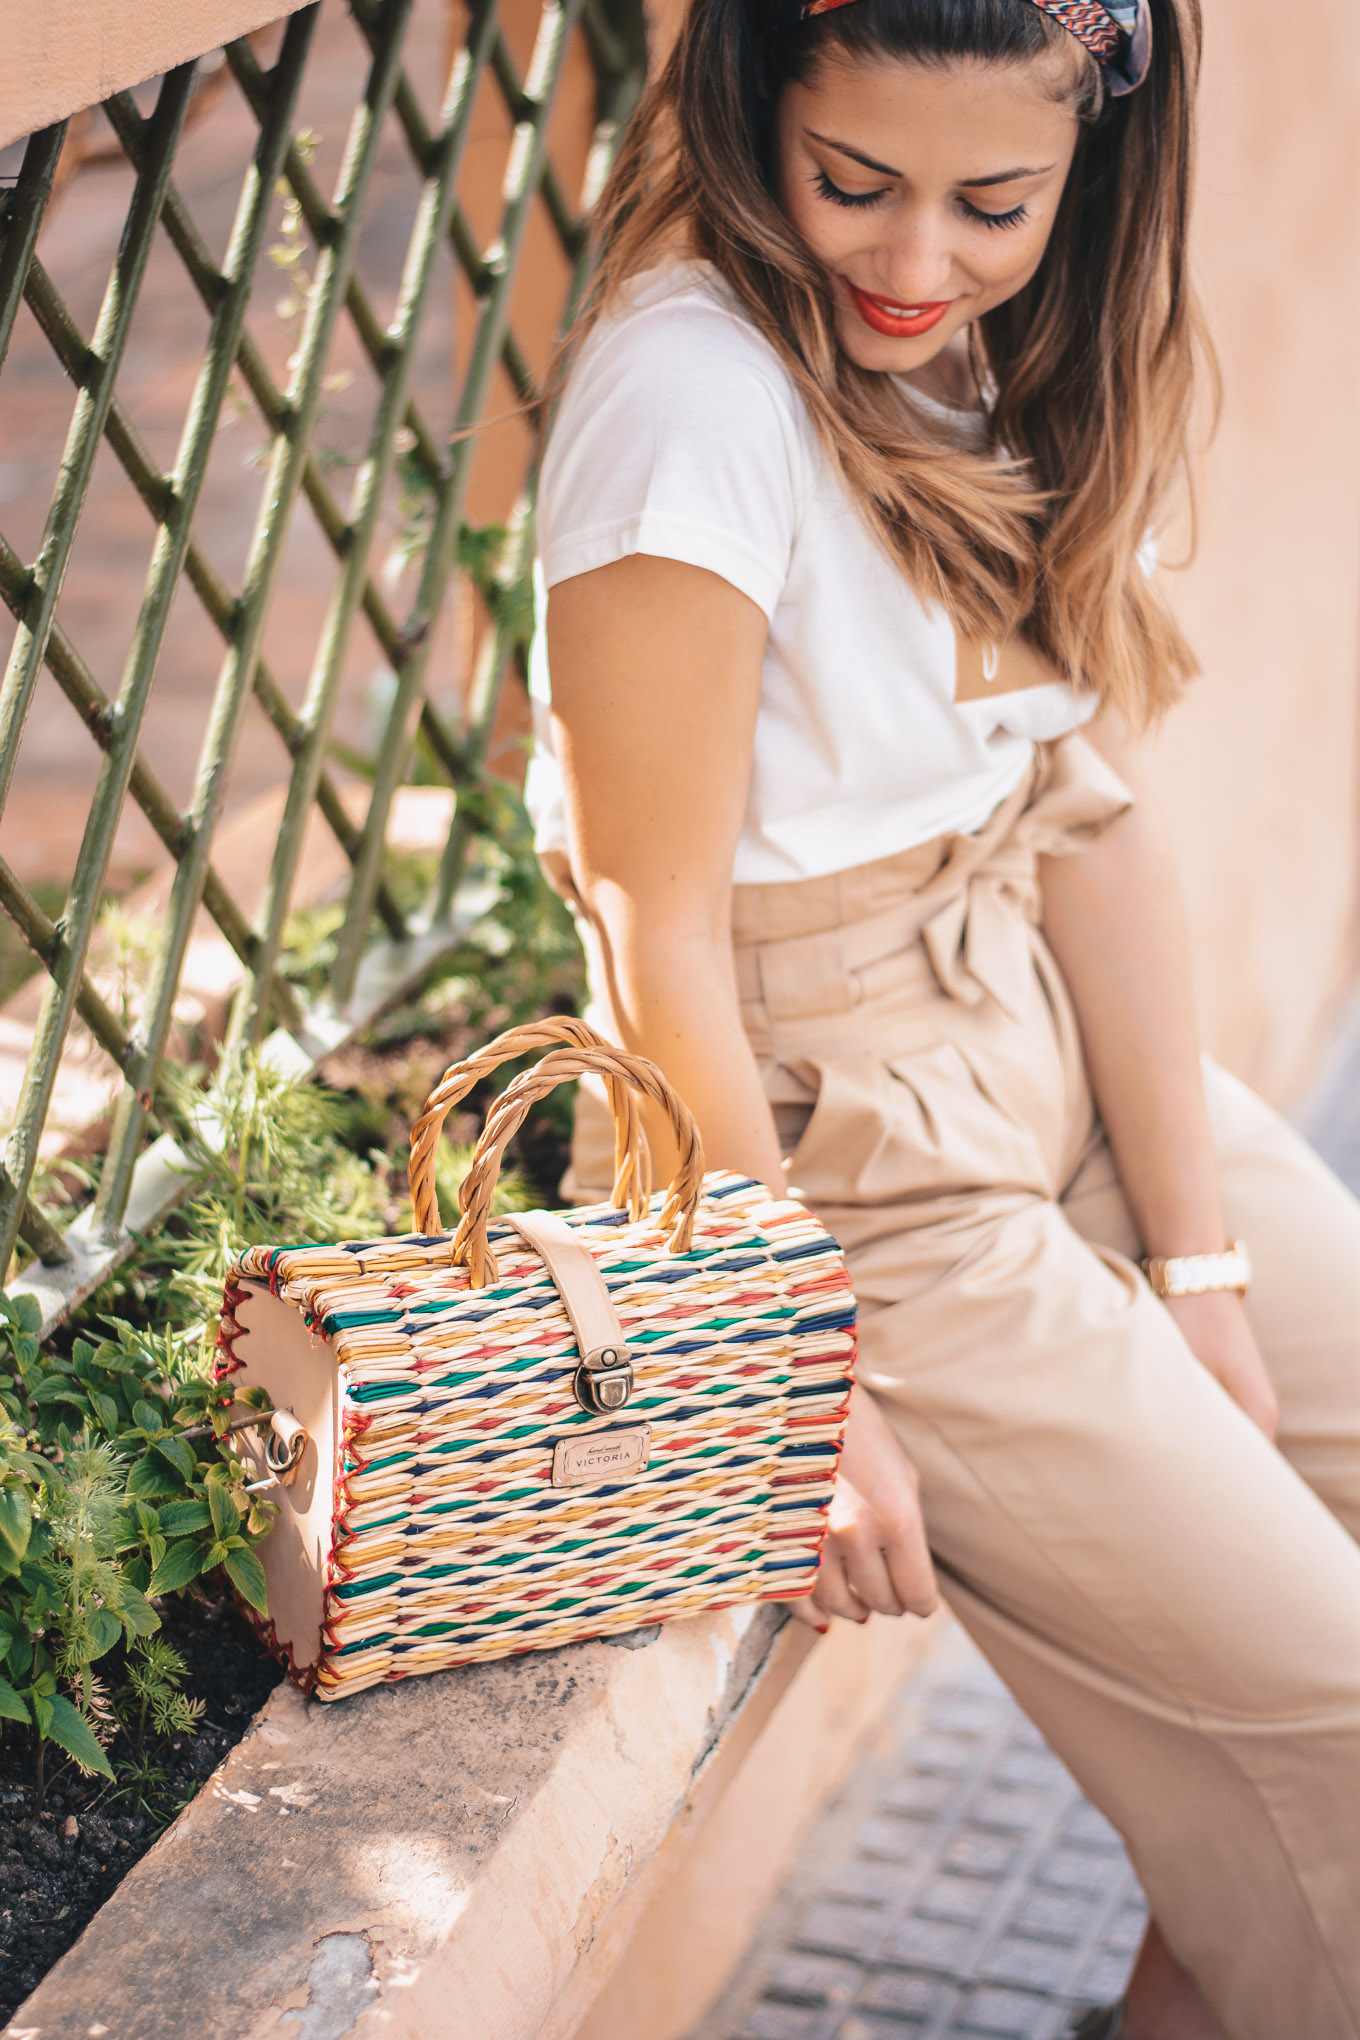 Victoria handmade basket